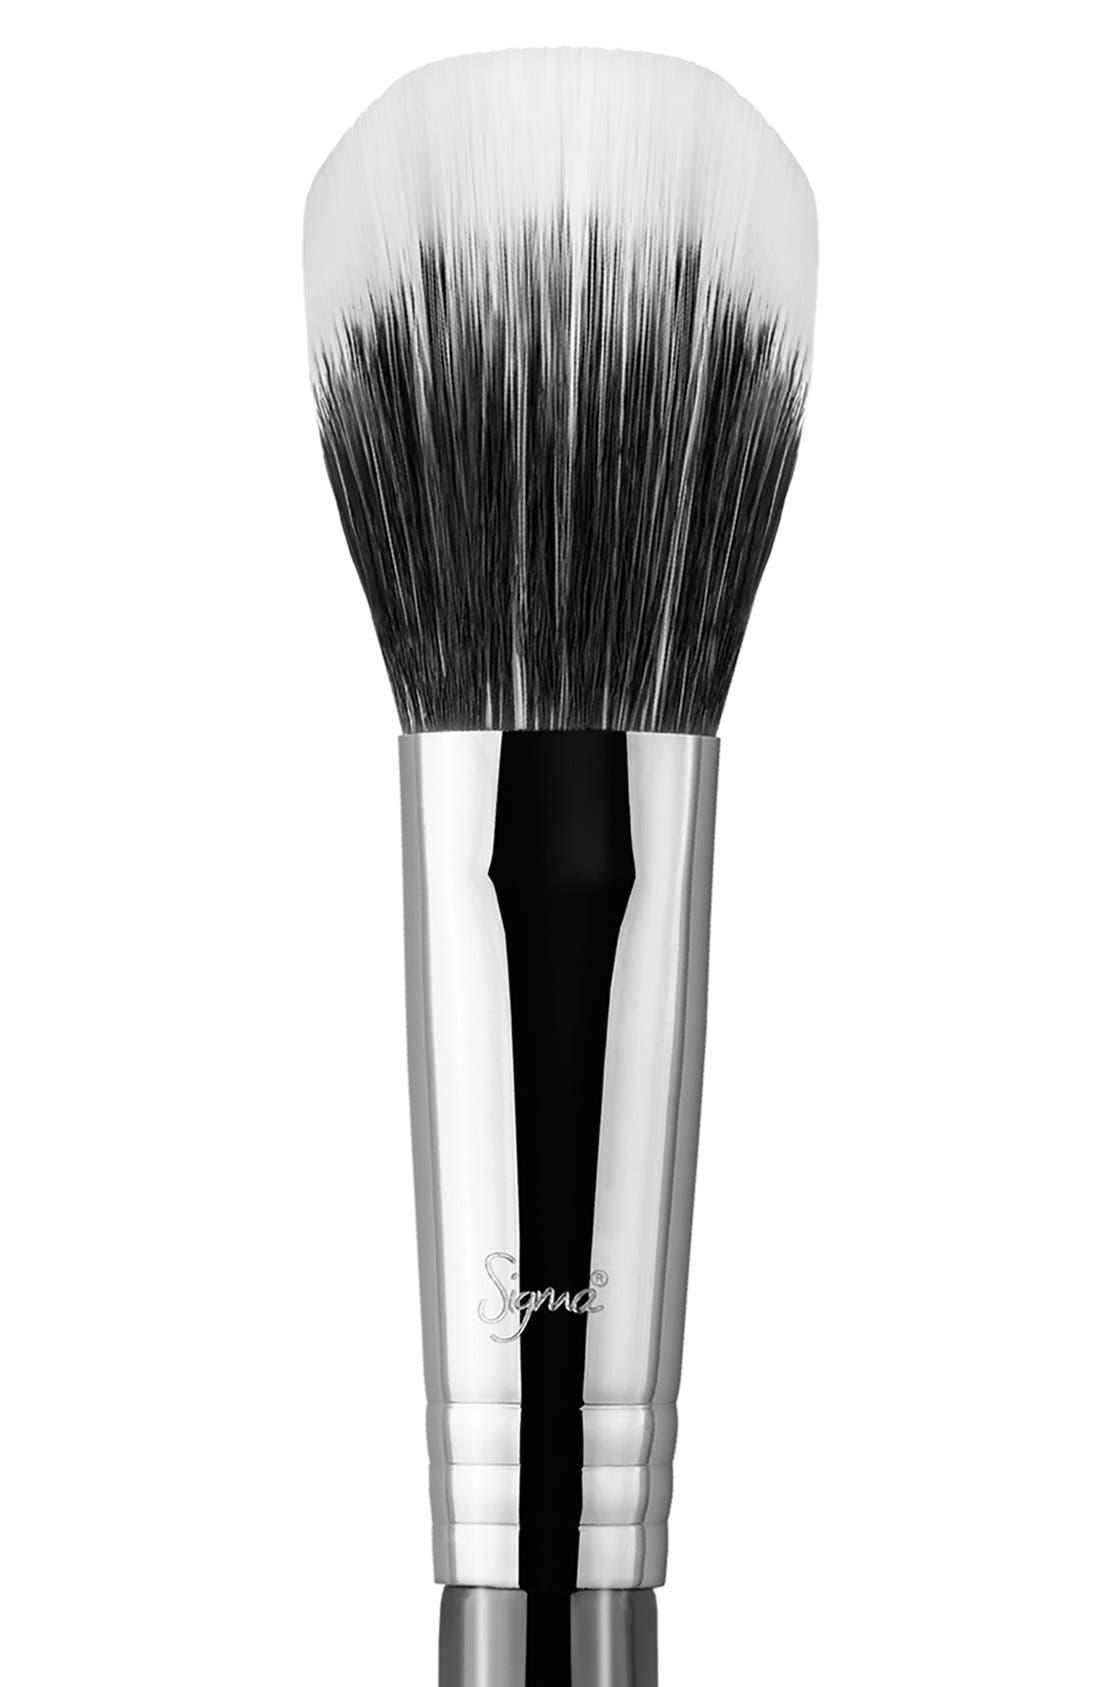 F15 Duo Fibre Powder/Blush Brush,                             Alternate thumbnail 2, color,                             NO COLOR